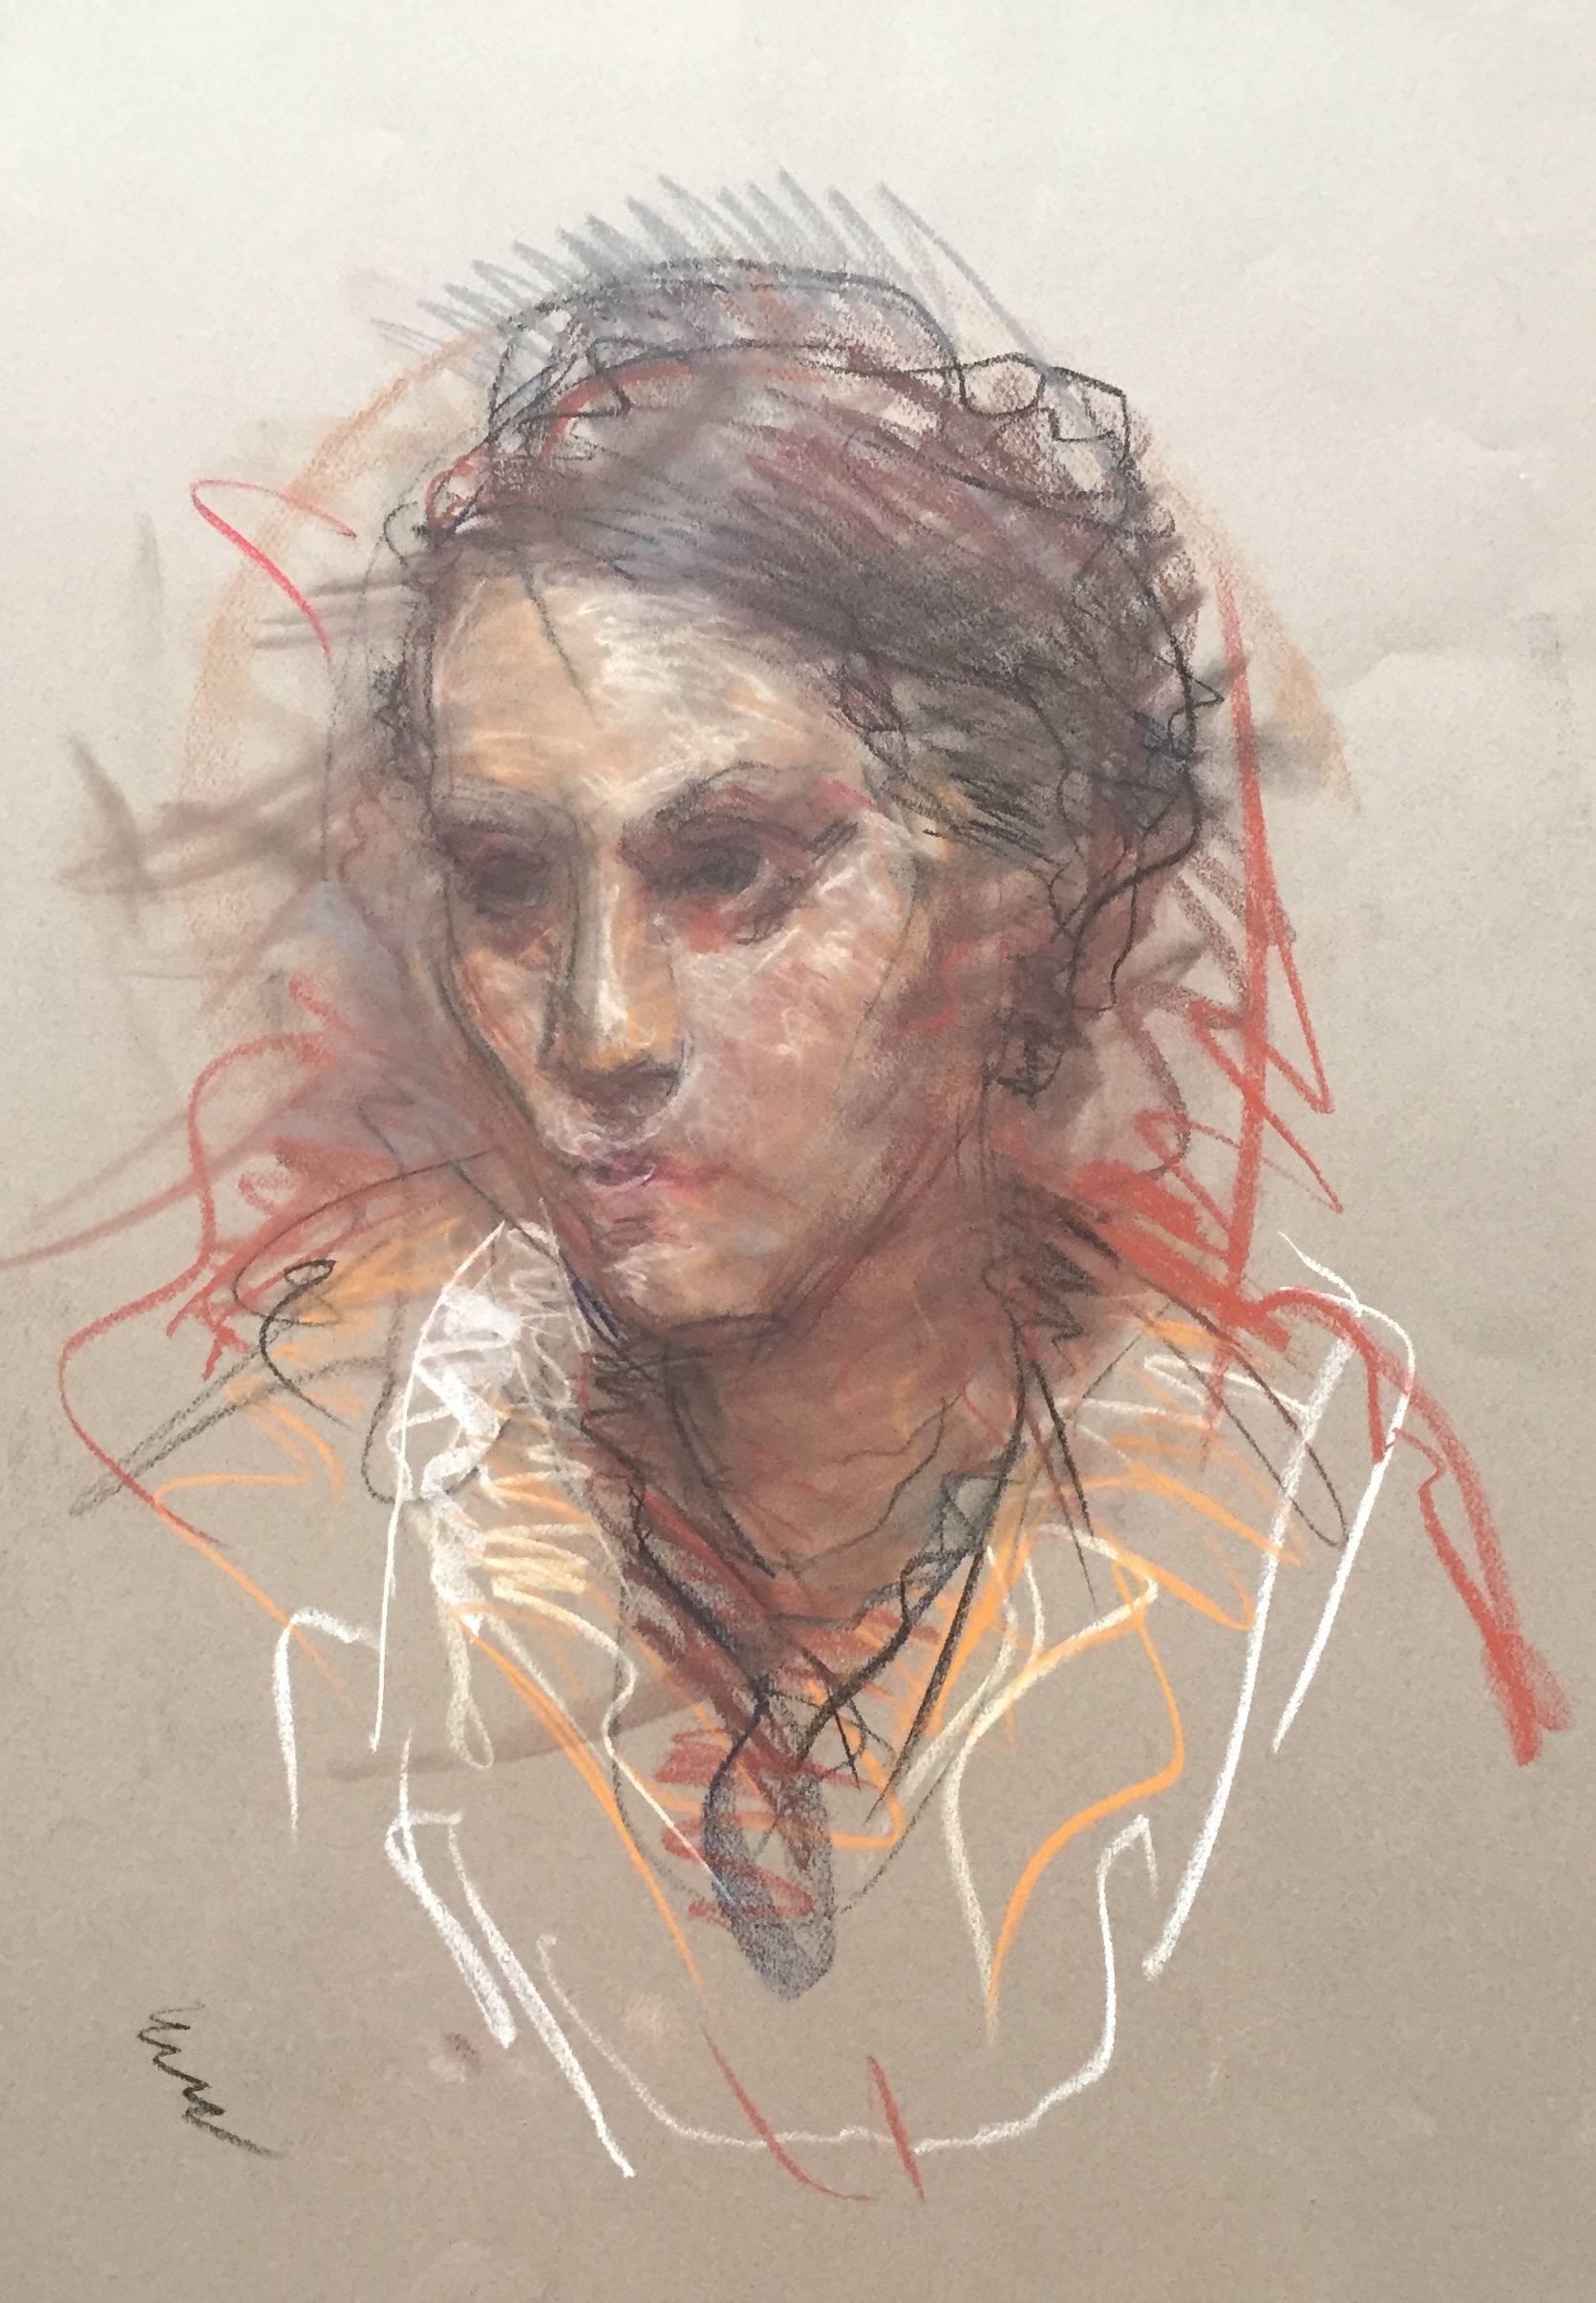 Francisco Zuniga Francisco Zuniga Original Conte Crayon Drawing Hand Signed Female Portrait Art For Sale At 1stdibs